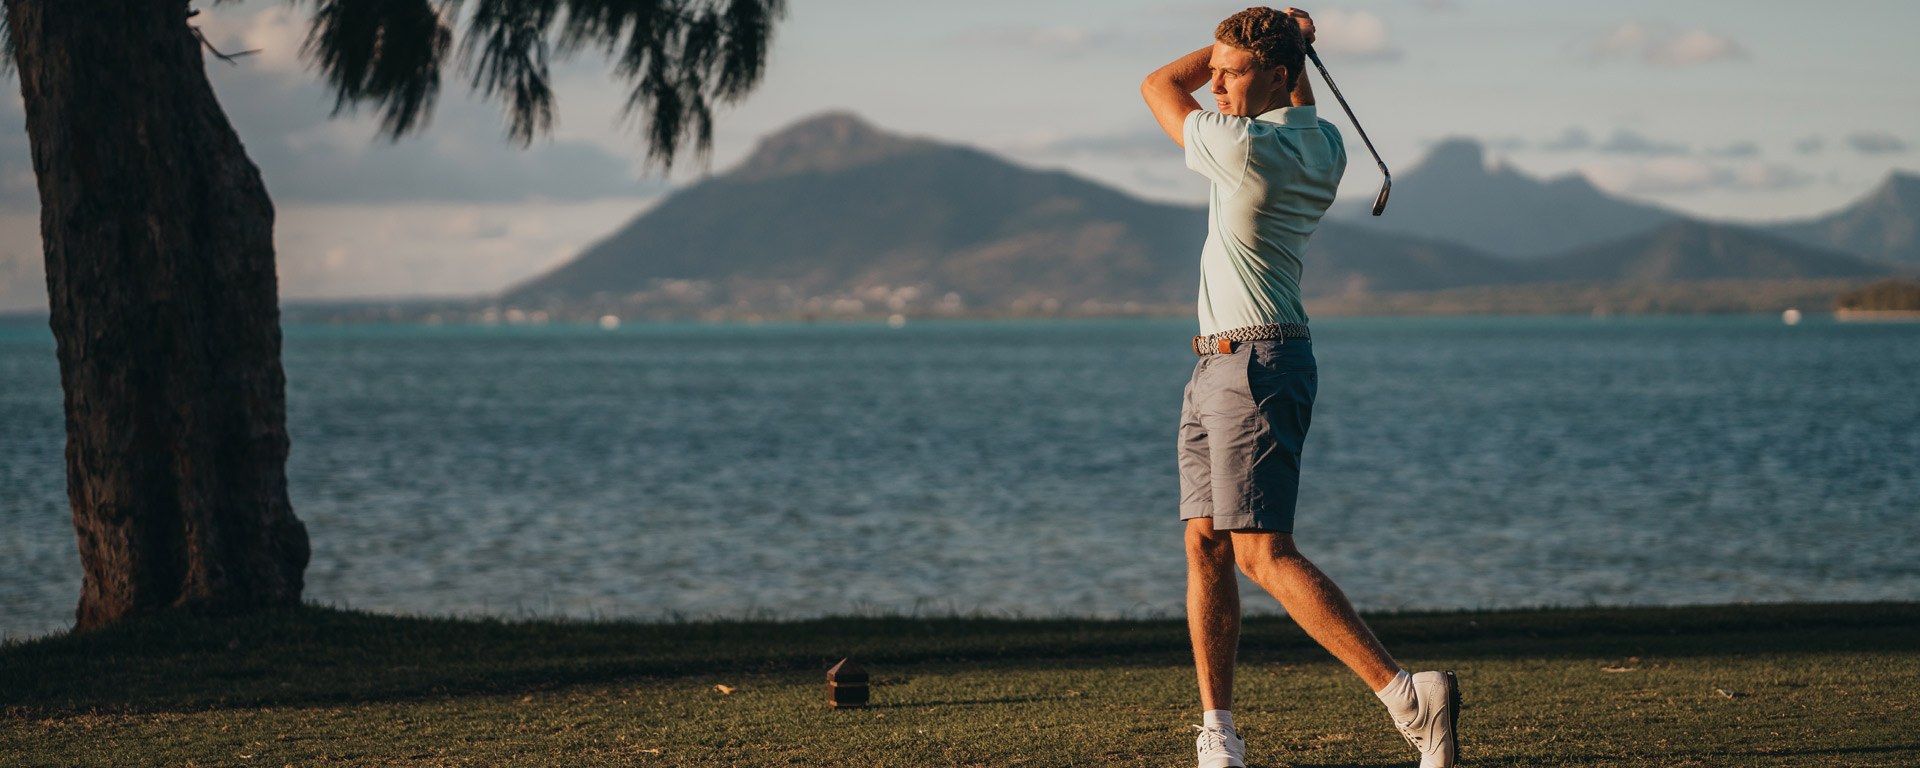 mauritius golf paradis beachcomber